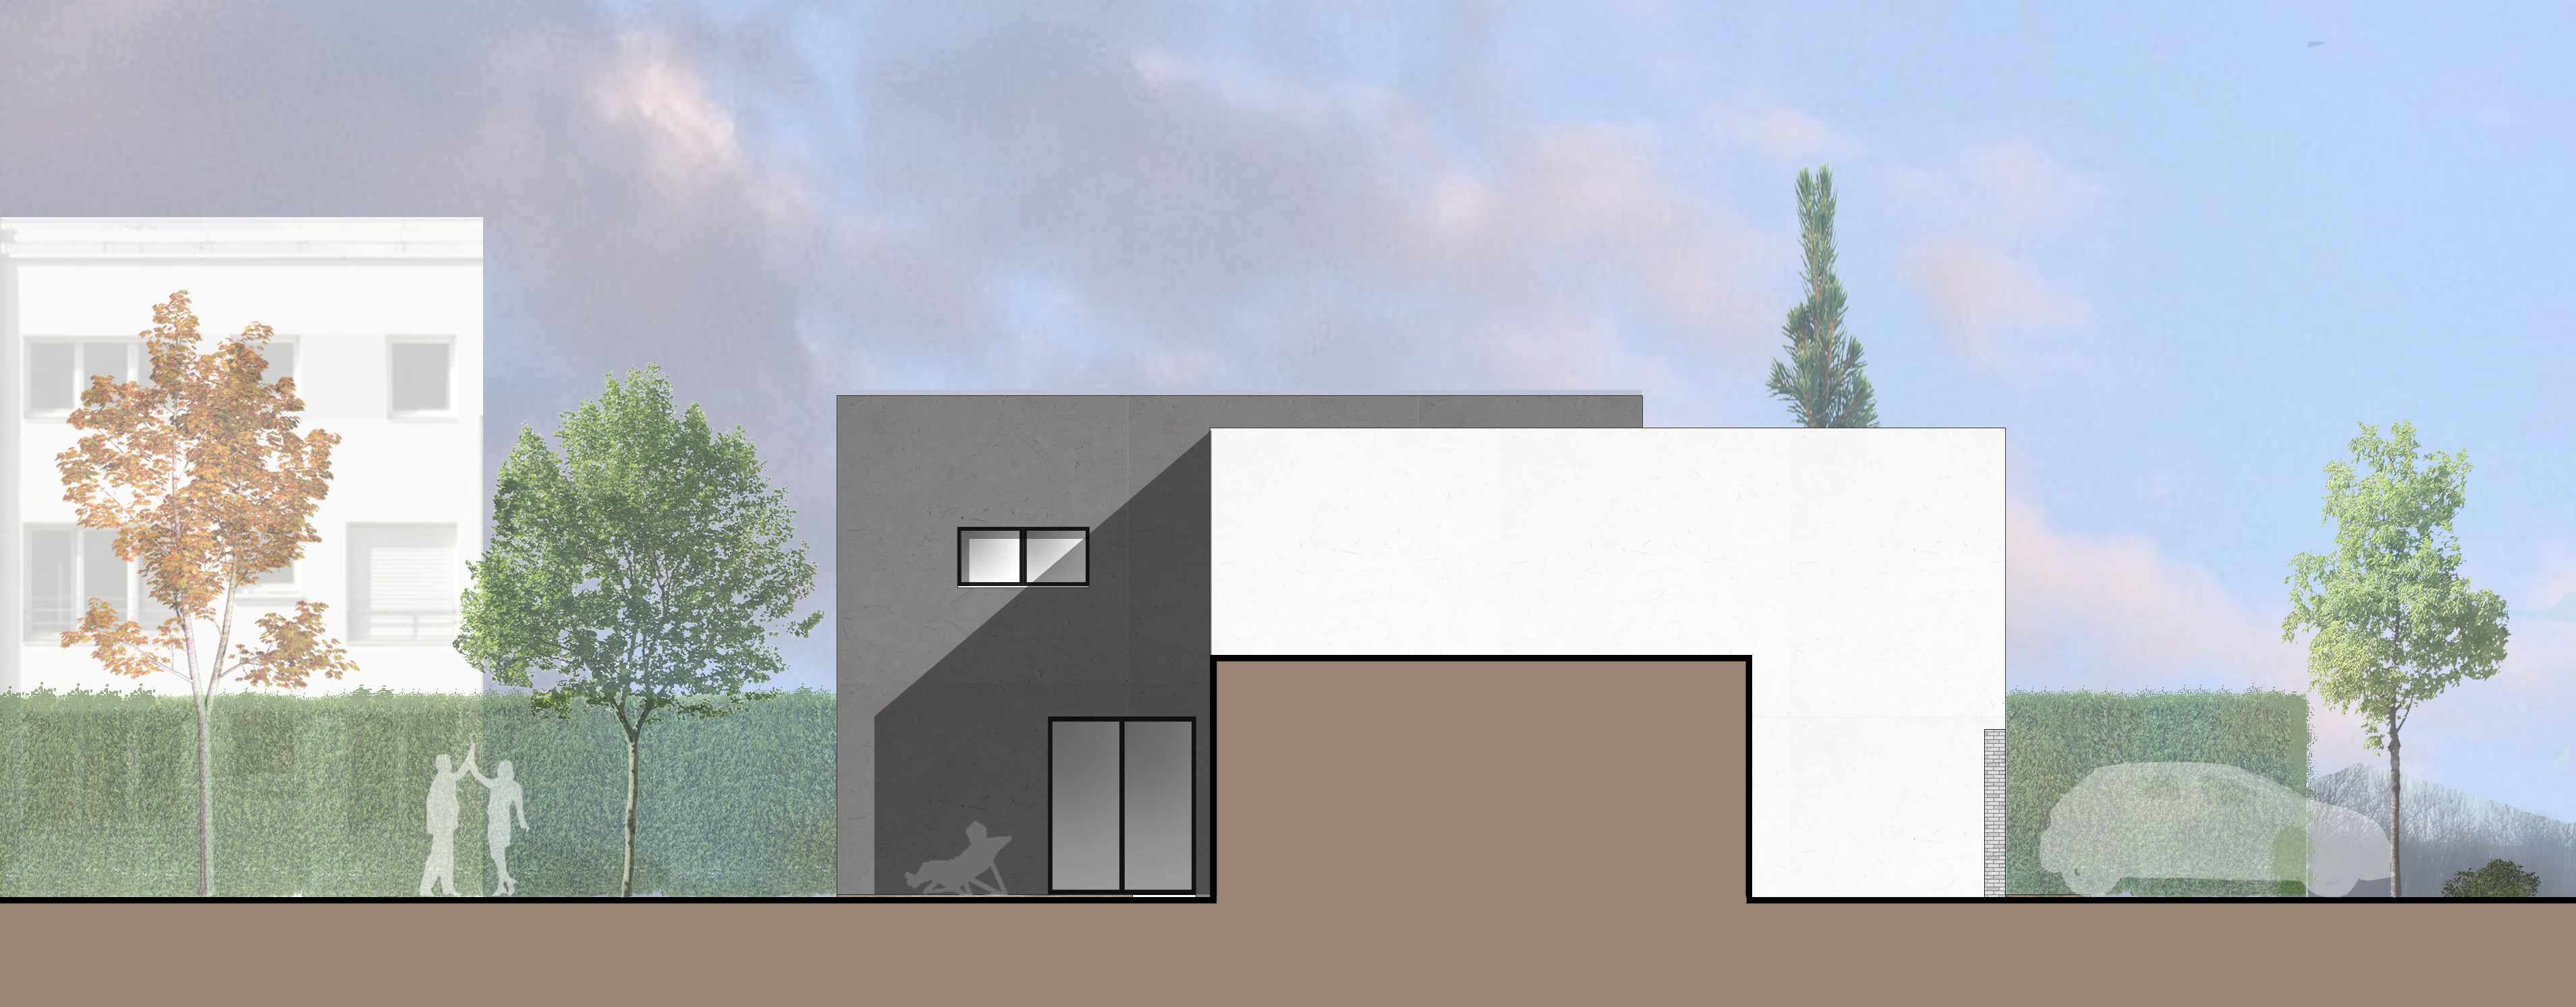 6 - Facade Projet 4